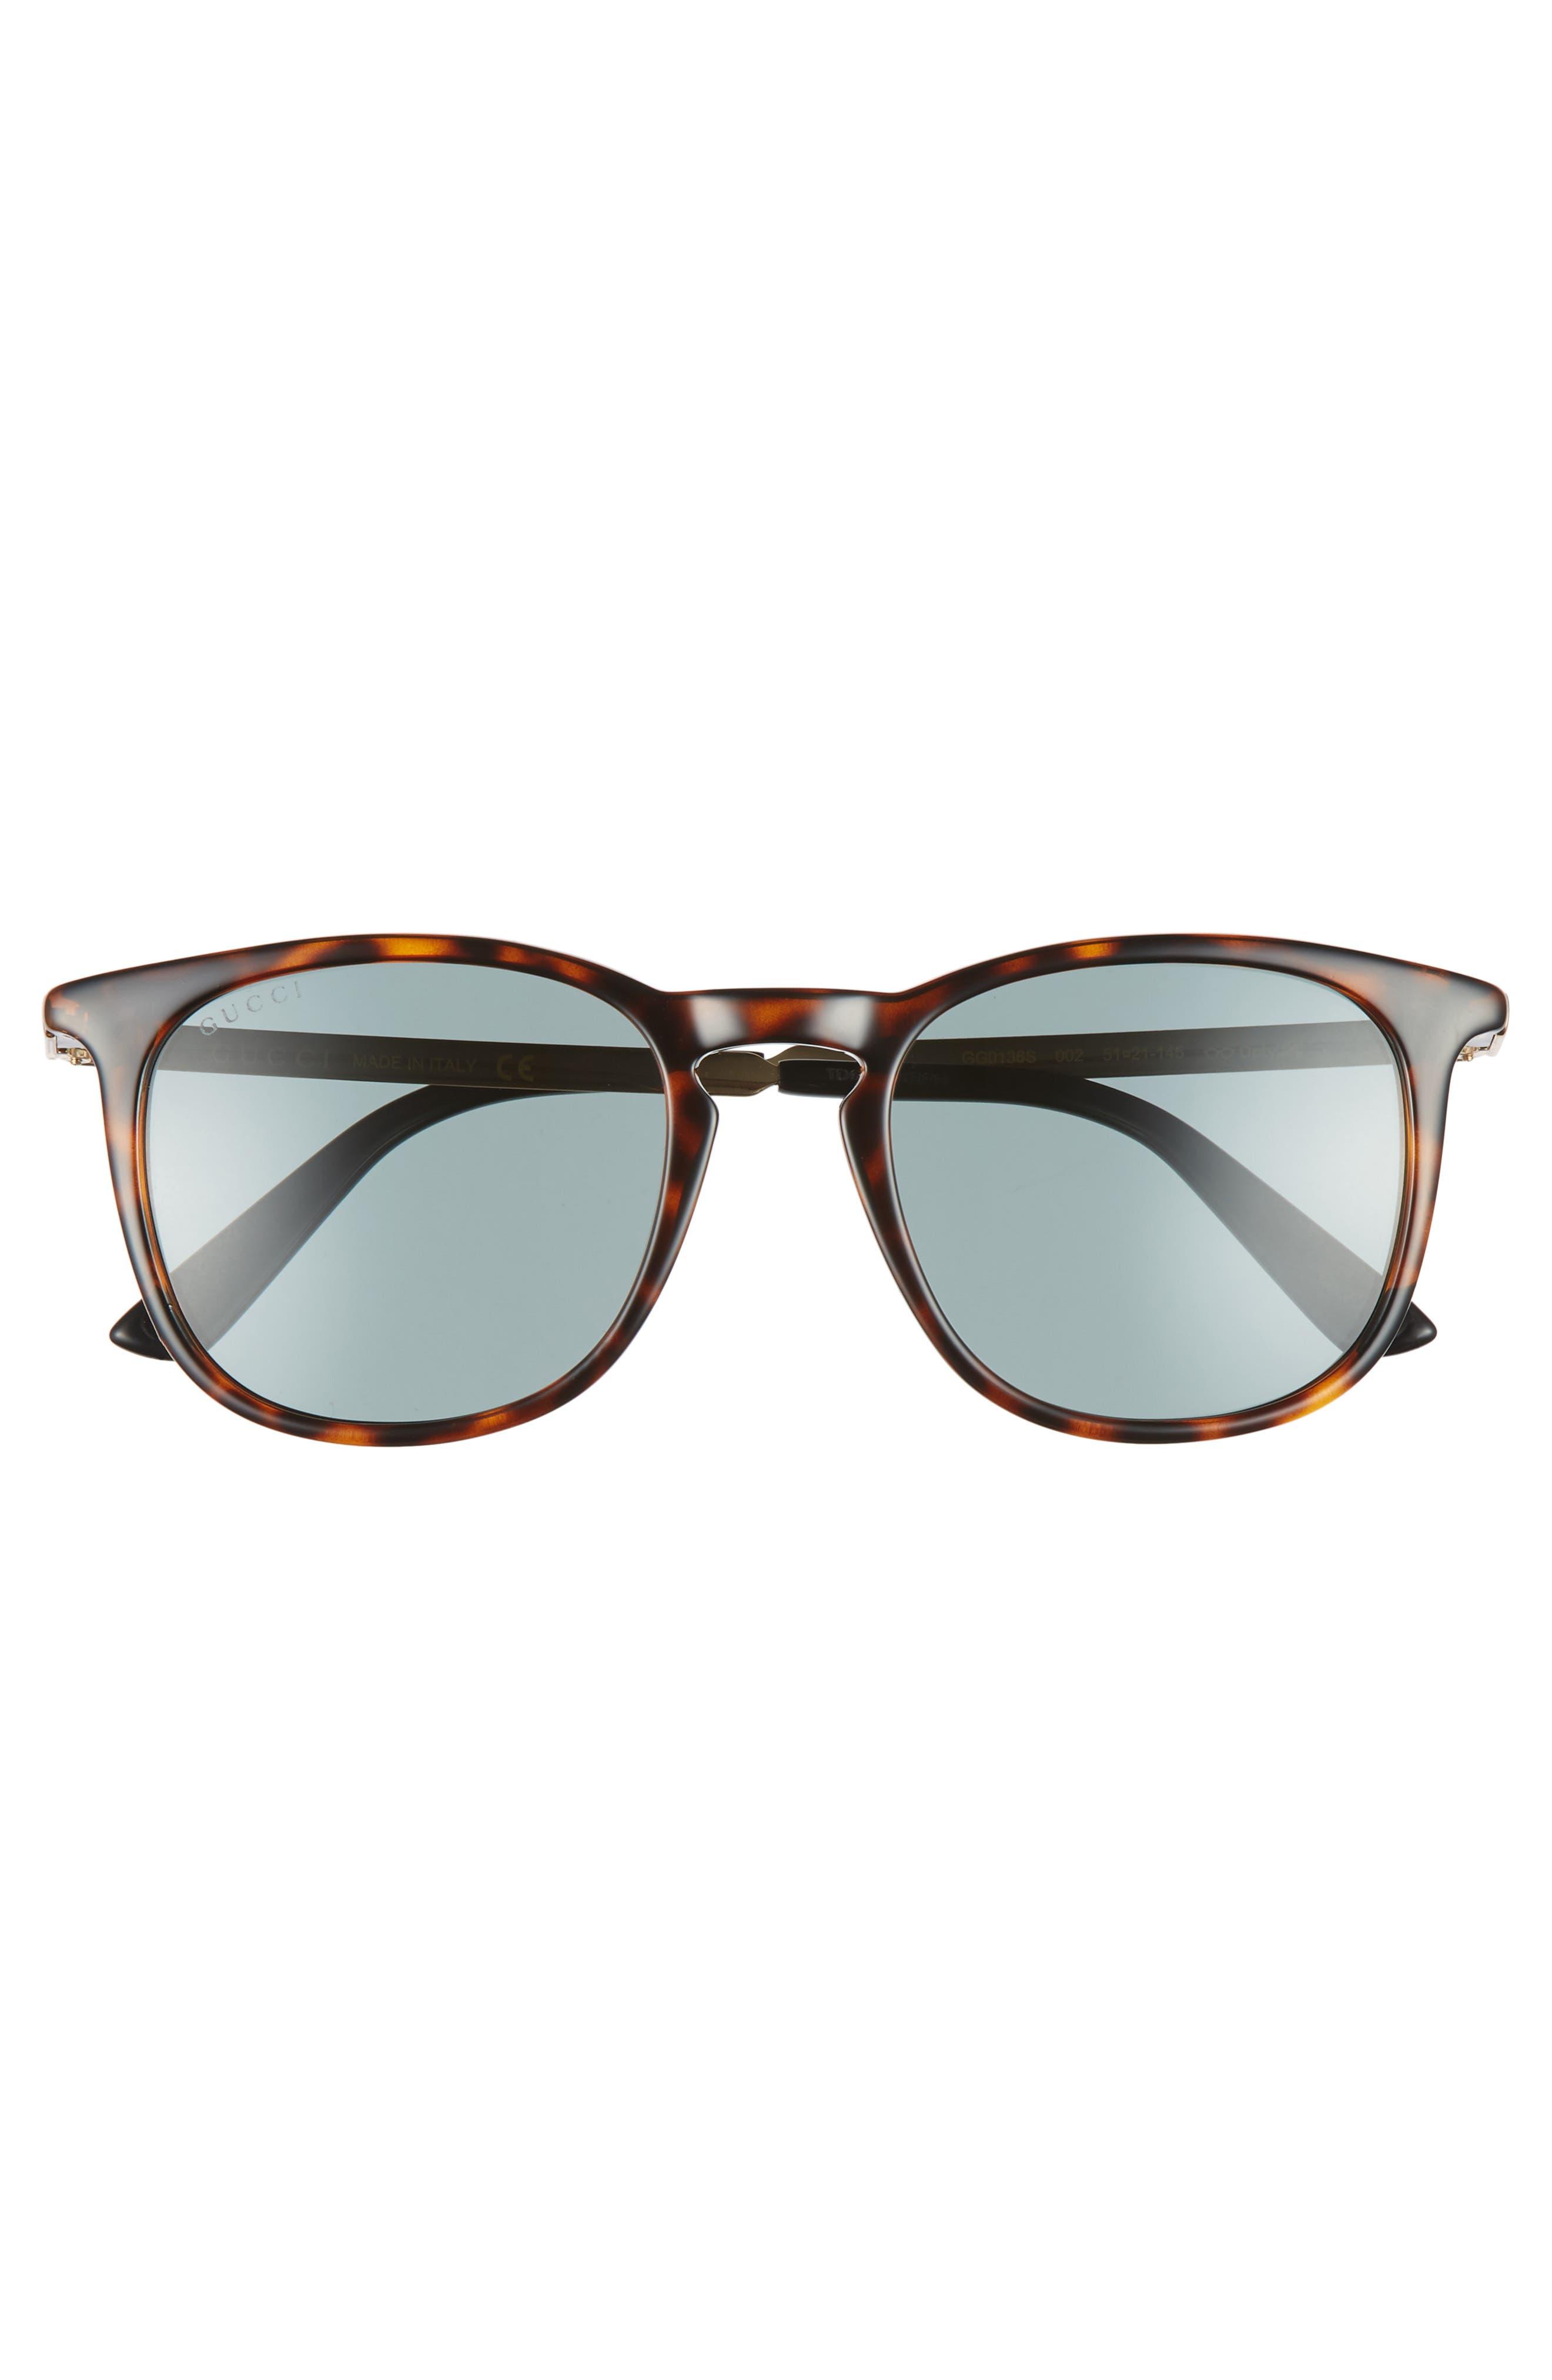 Optyl 51mm Sunglasses,                             Alternate thumbnail 4, color,